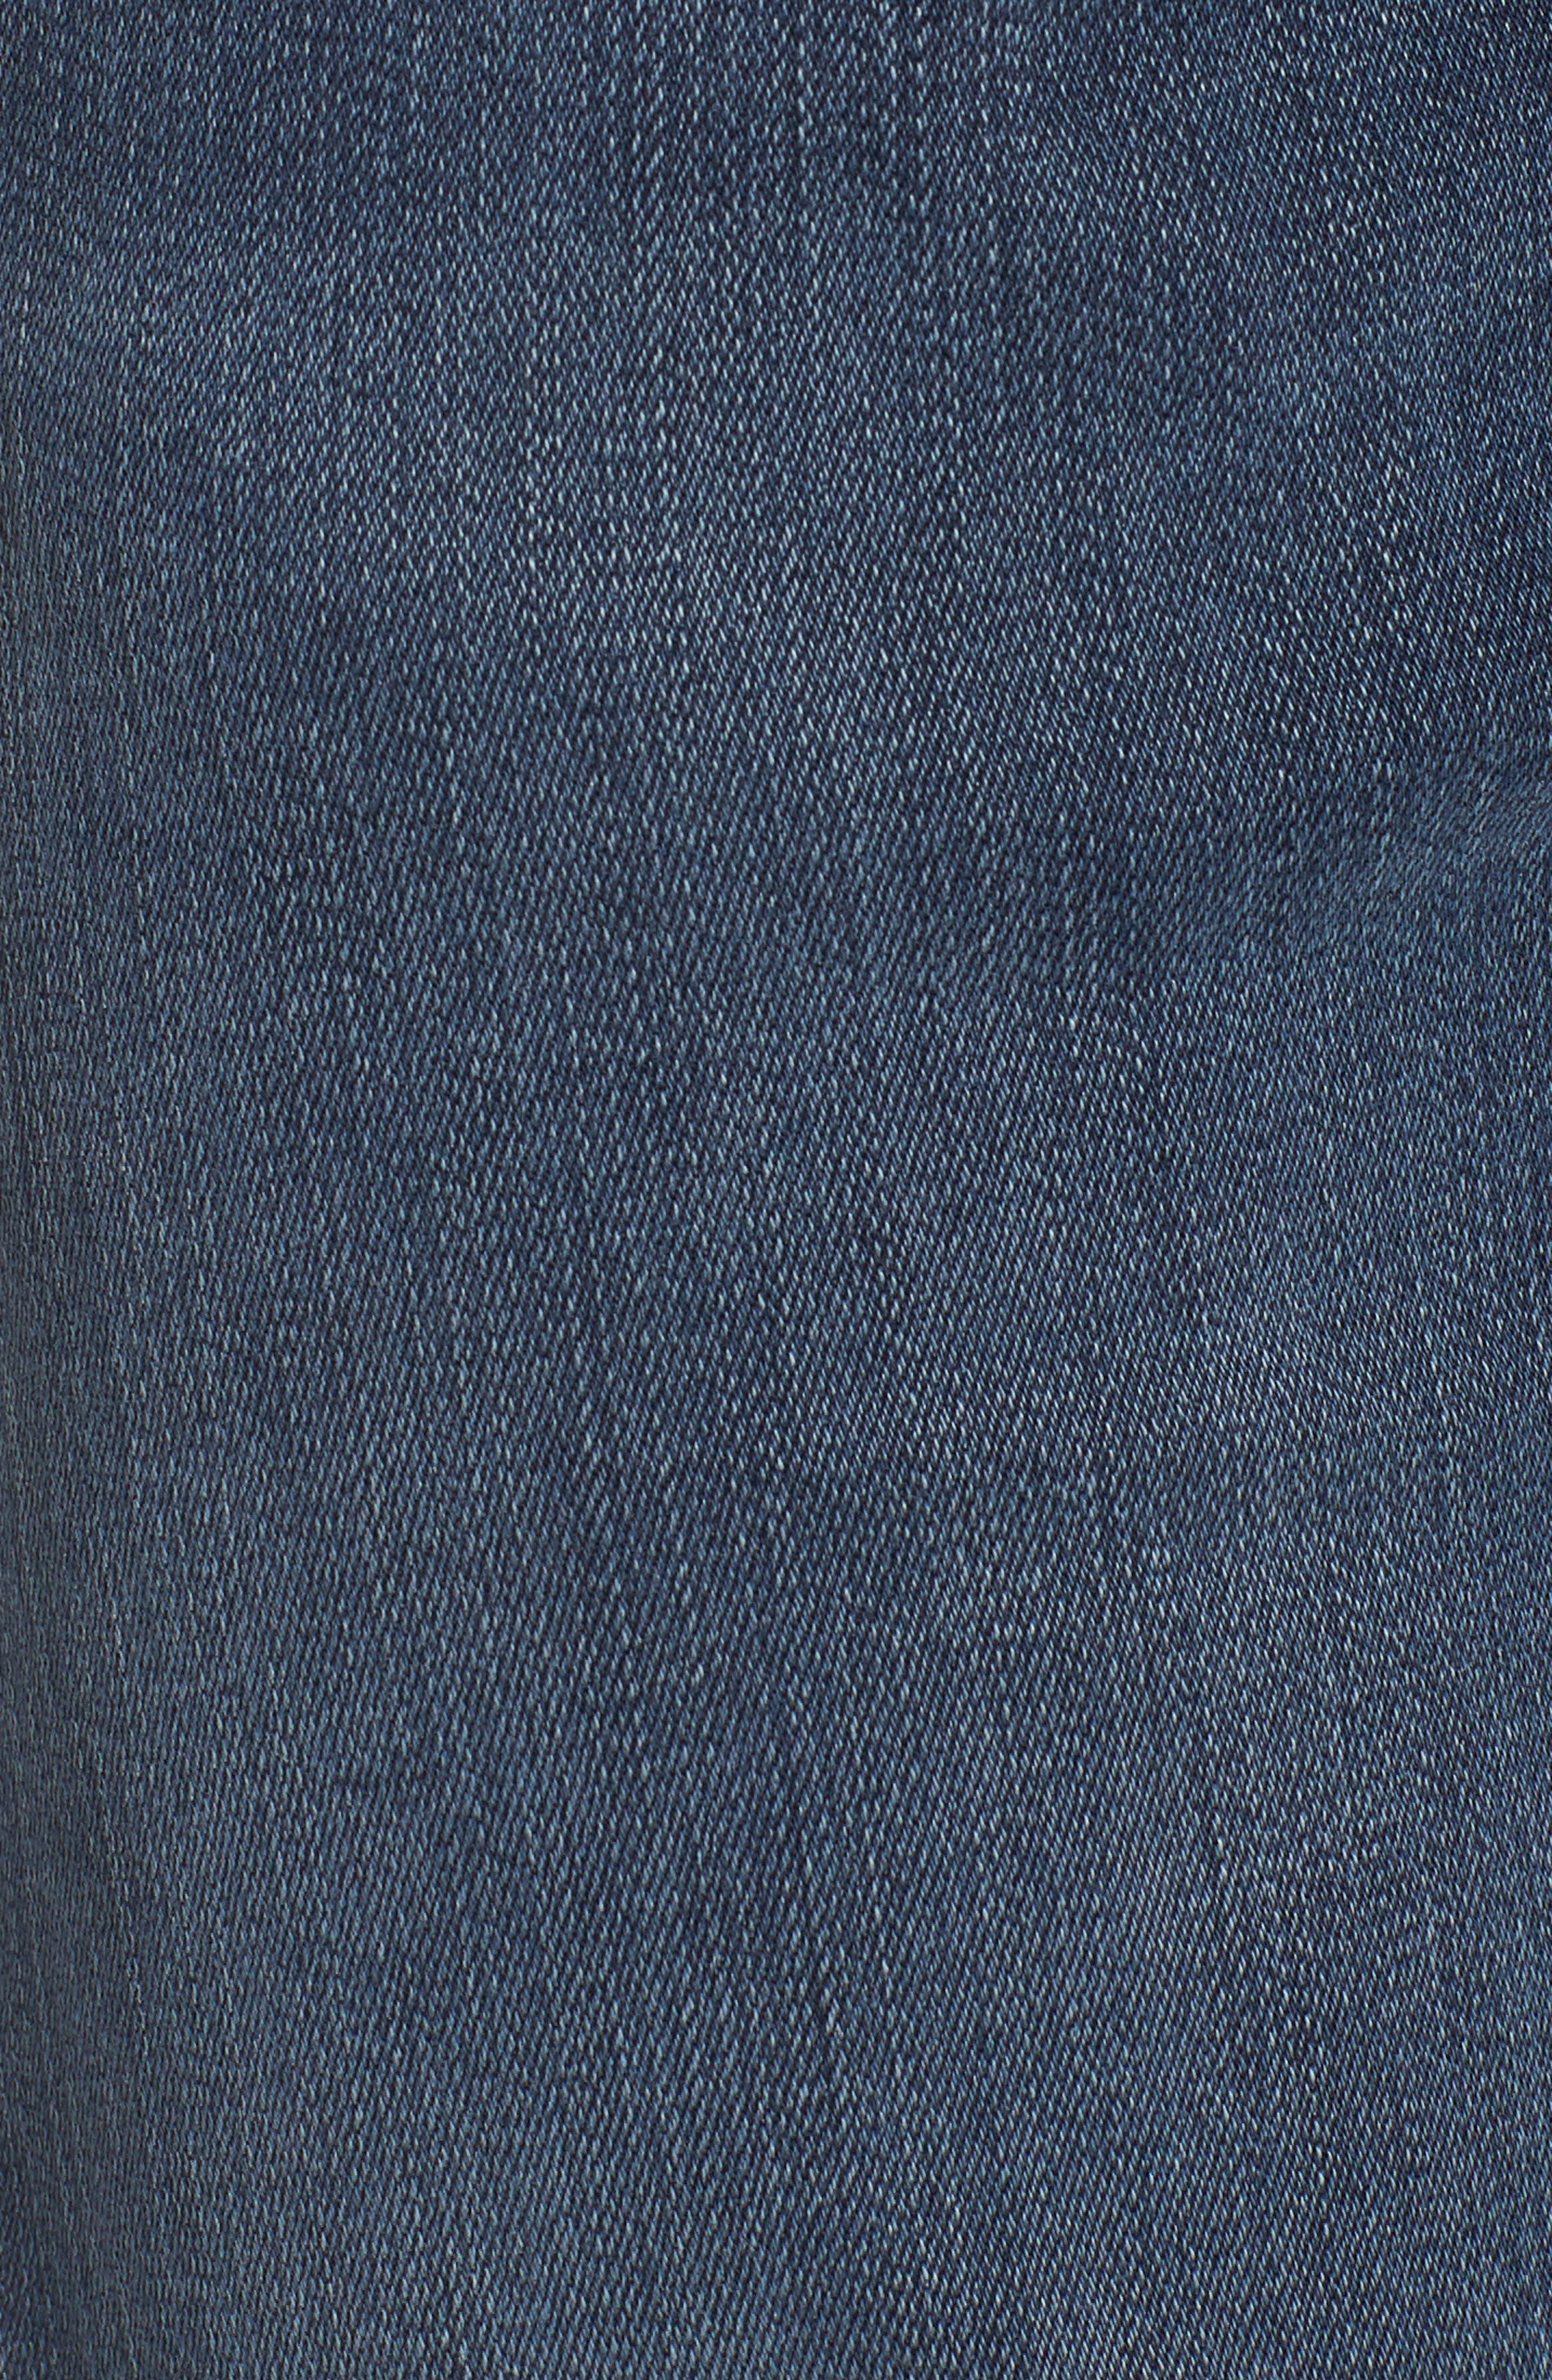 Jimmy Slim Straight Leg Jeans,                             Alternate thumbnail 5, color,                             Lexicon